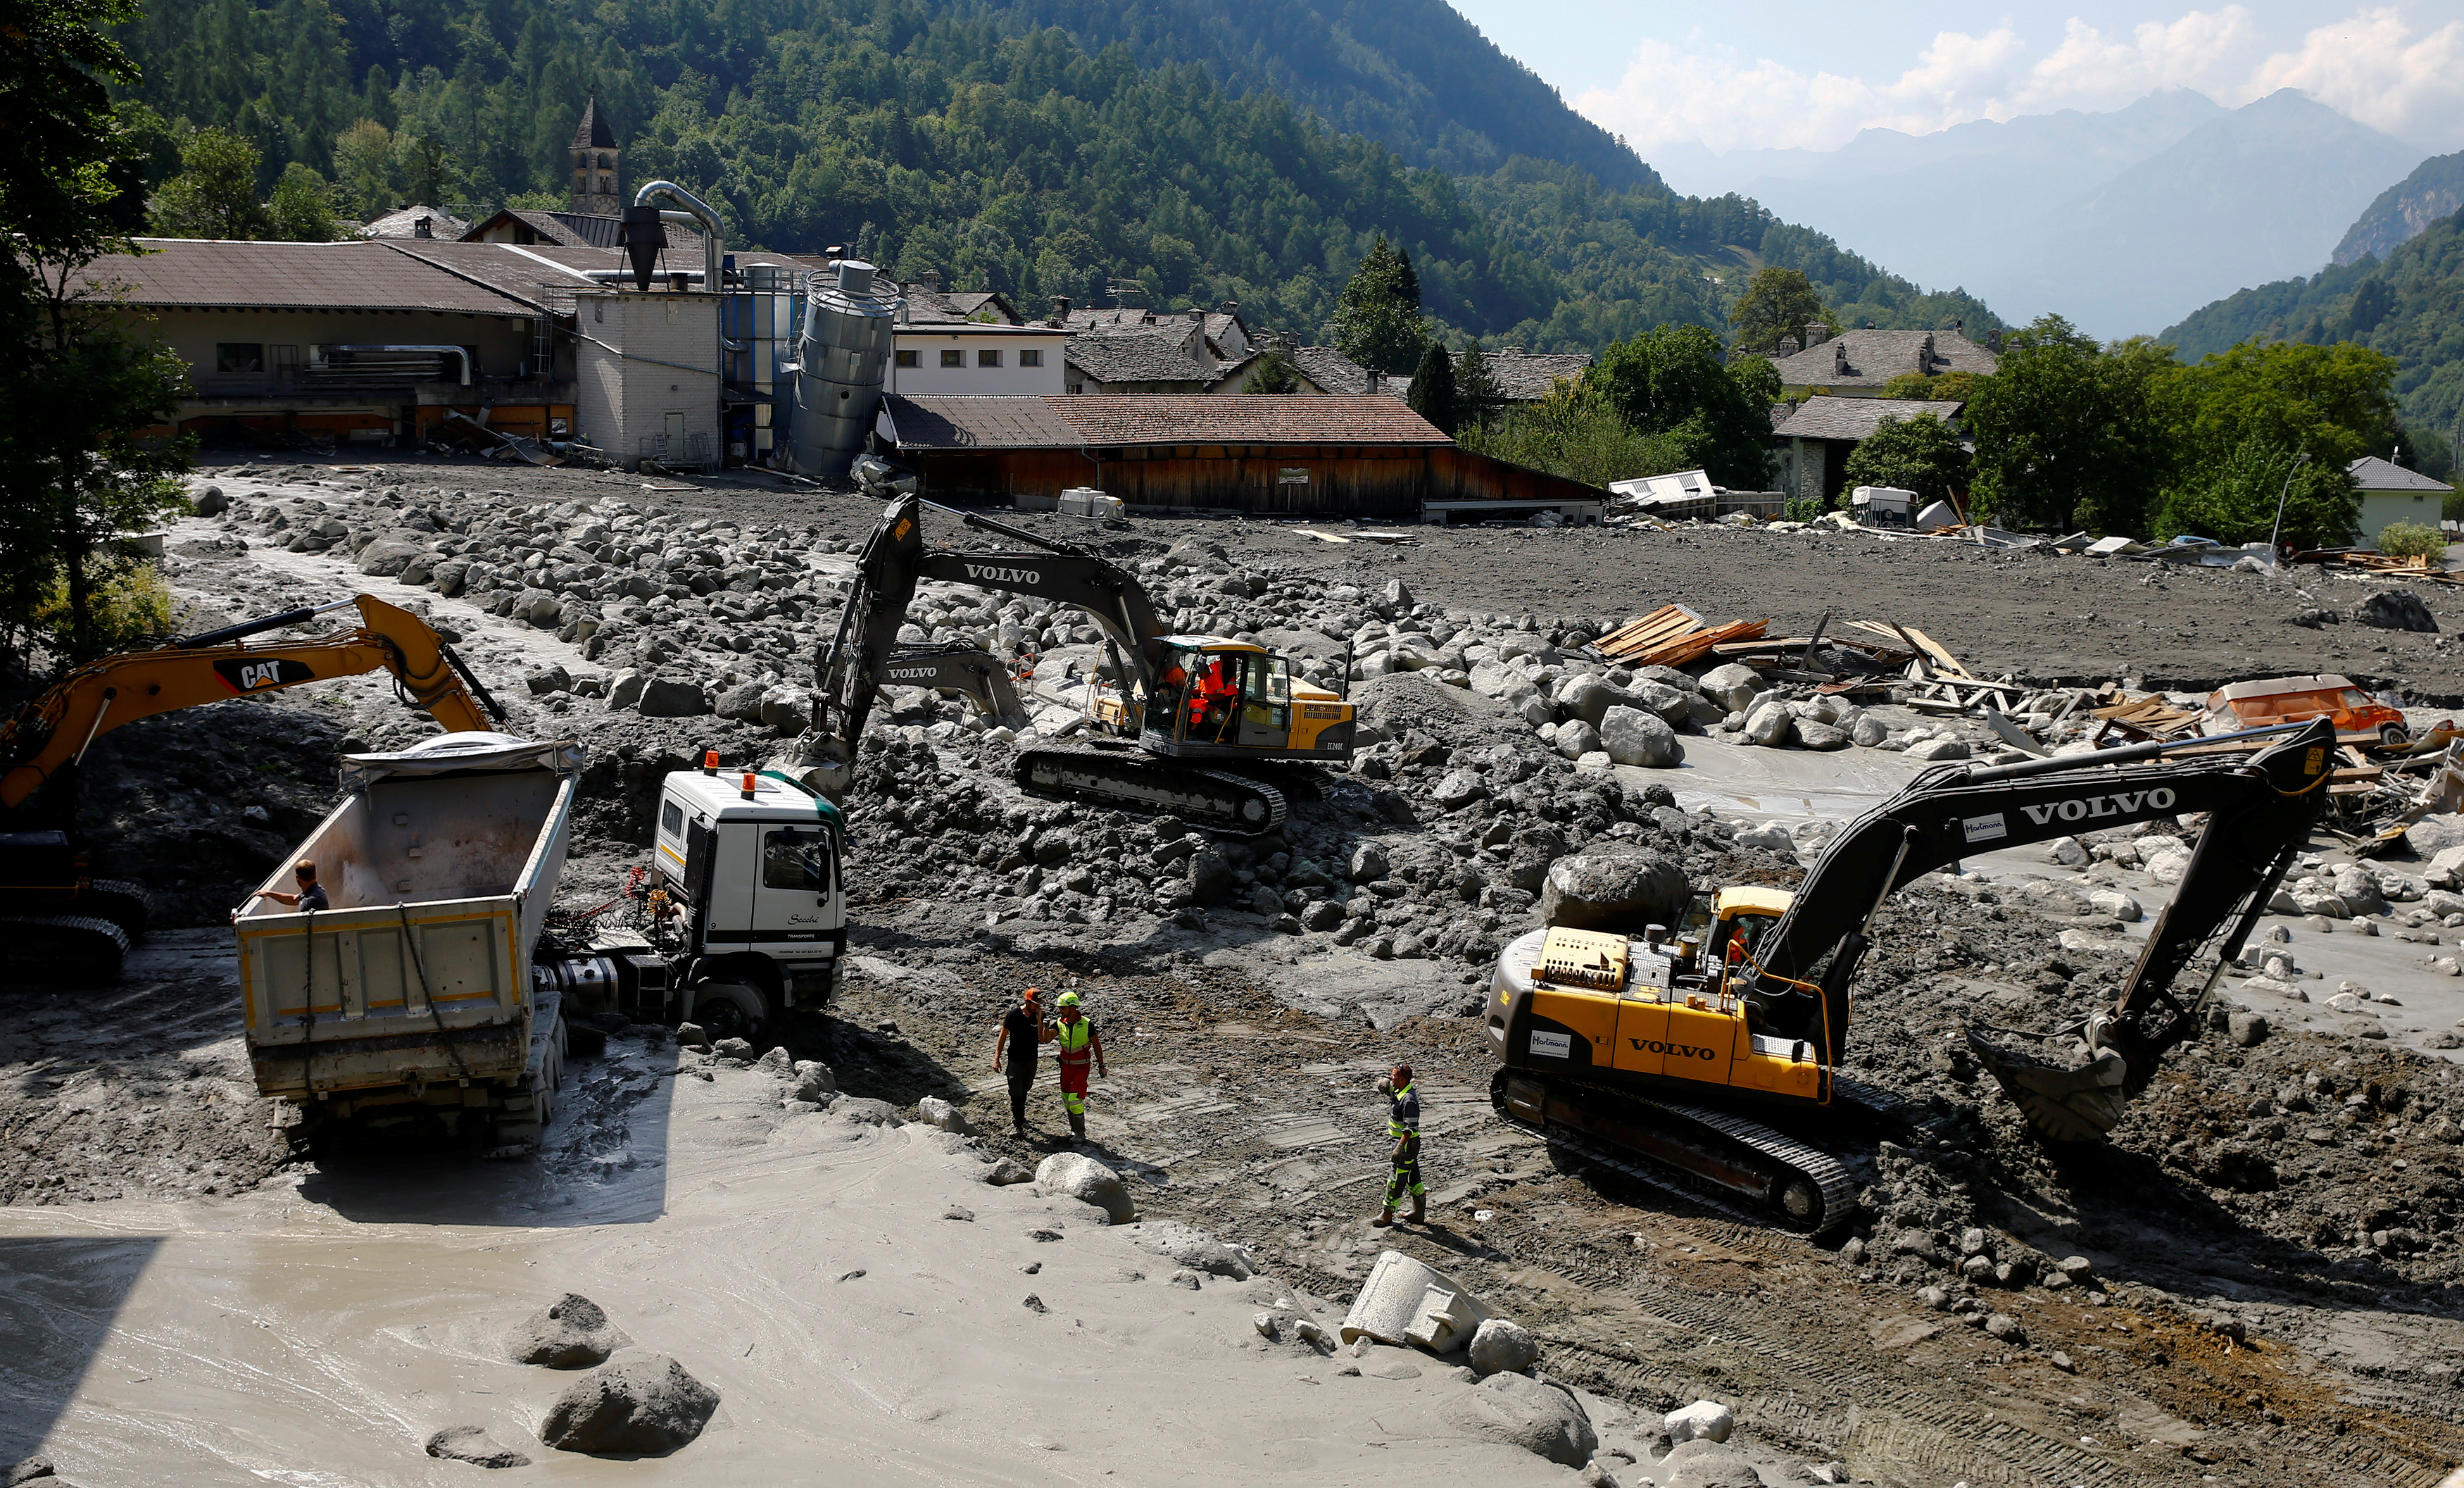 Excavators remove the debris from a landslide, near the village of Bondo, in Switzerland on Aug. 26, 2017. (REUTERS/Arnd Wiegmann)